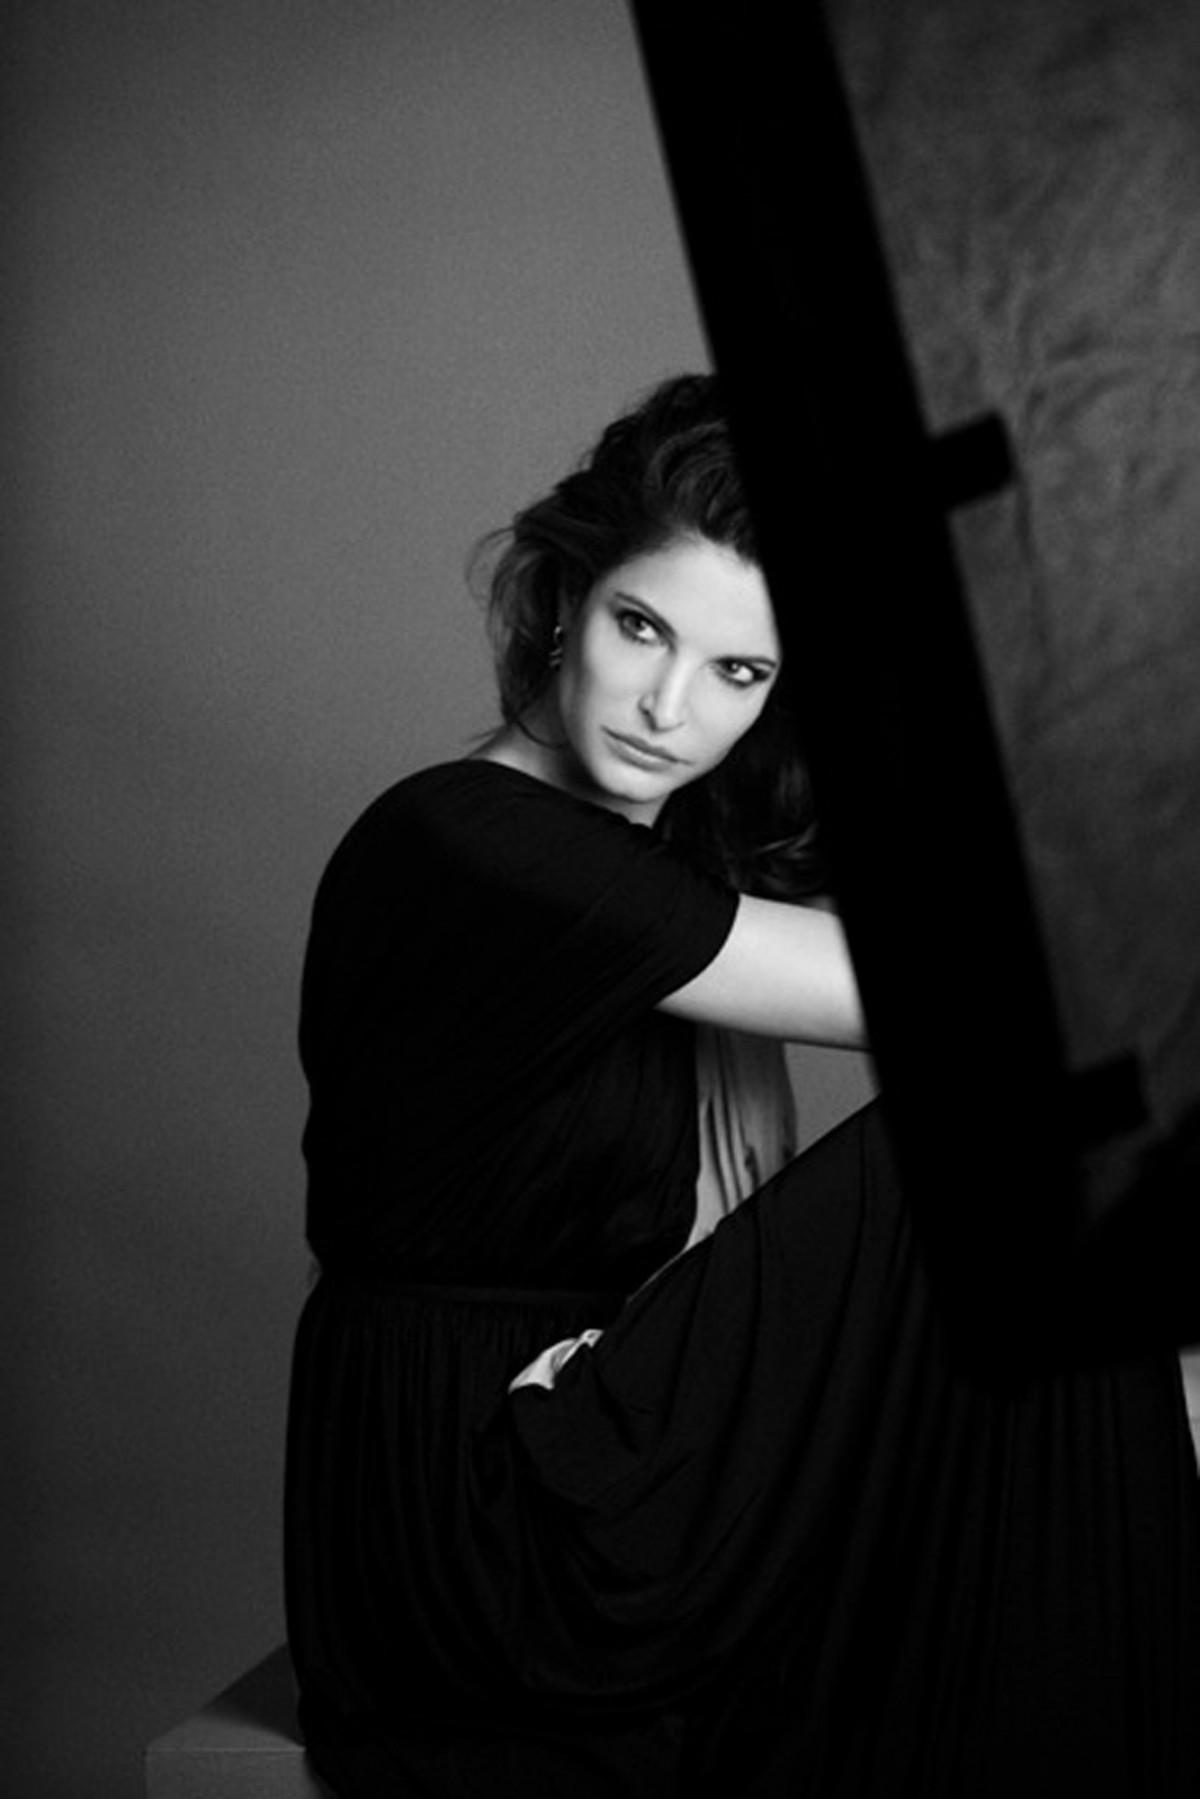 Stephanie Seymour Is Named Estee Lauder Spokesmodel